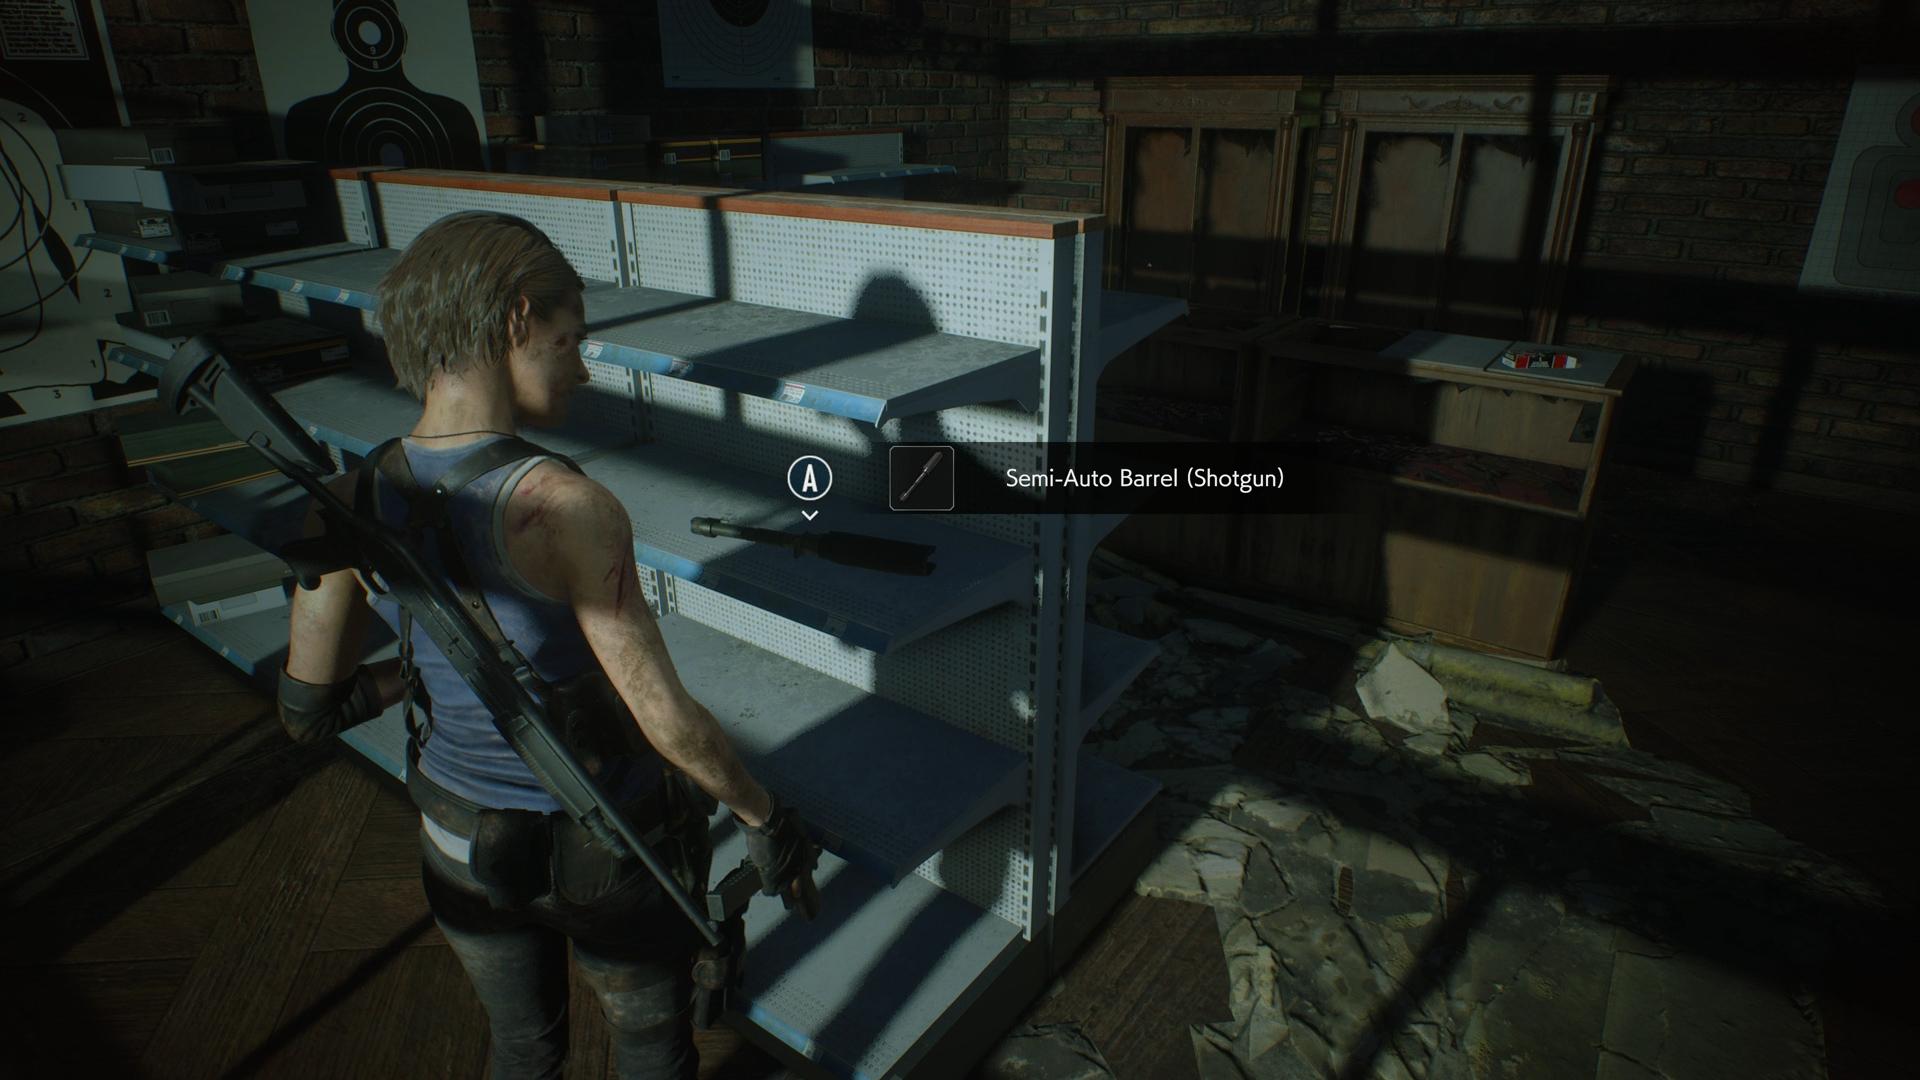 Resident Evil 3 Shotgun Semi-Auto Barrel location